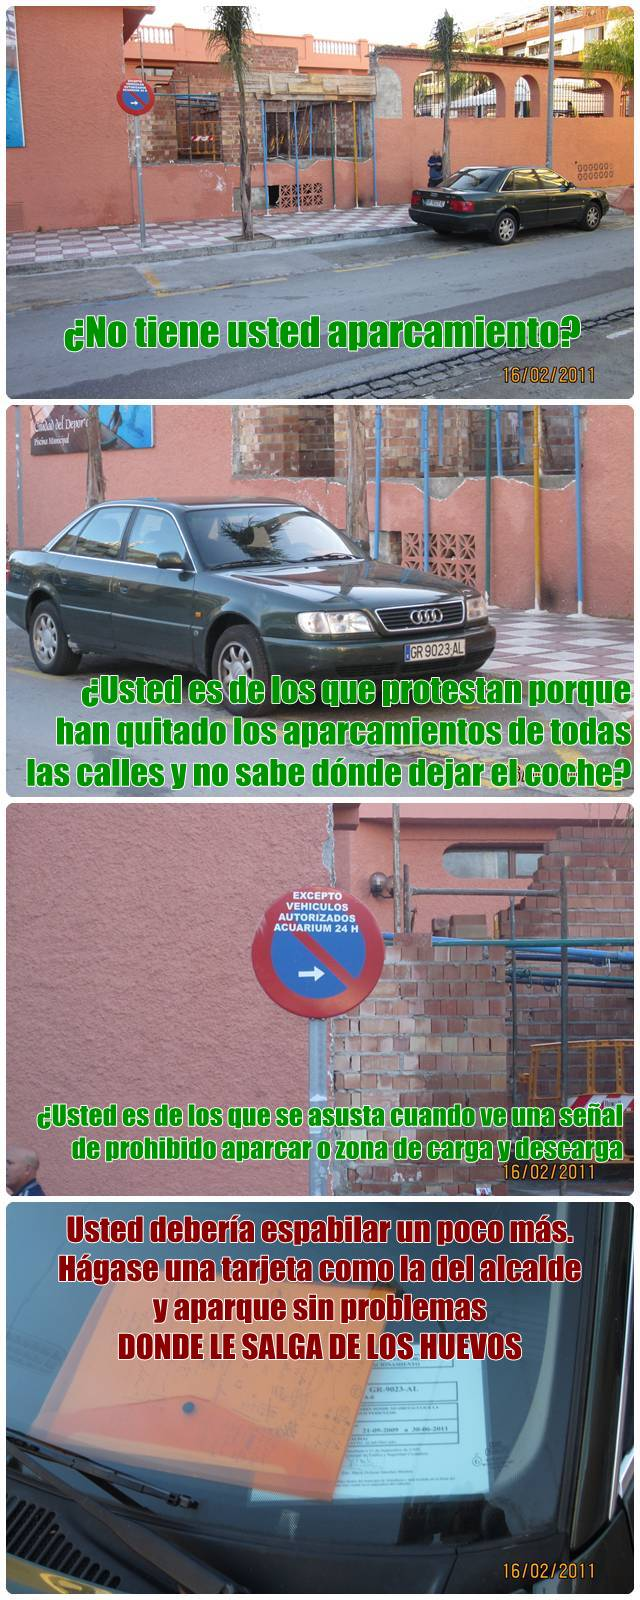 20110419192147-mosaico-alcalde-2.jpg